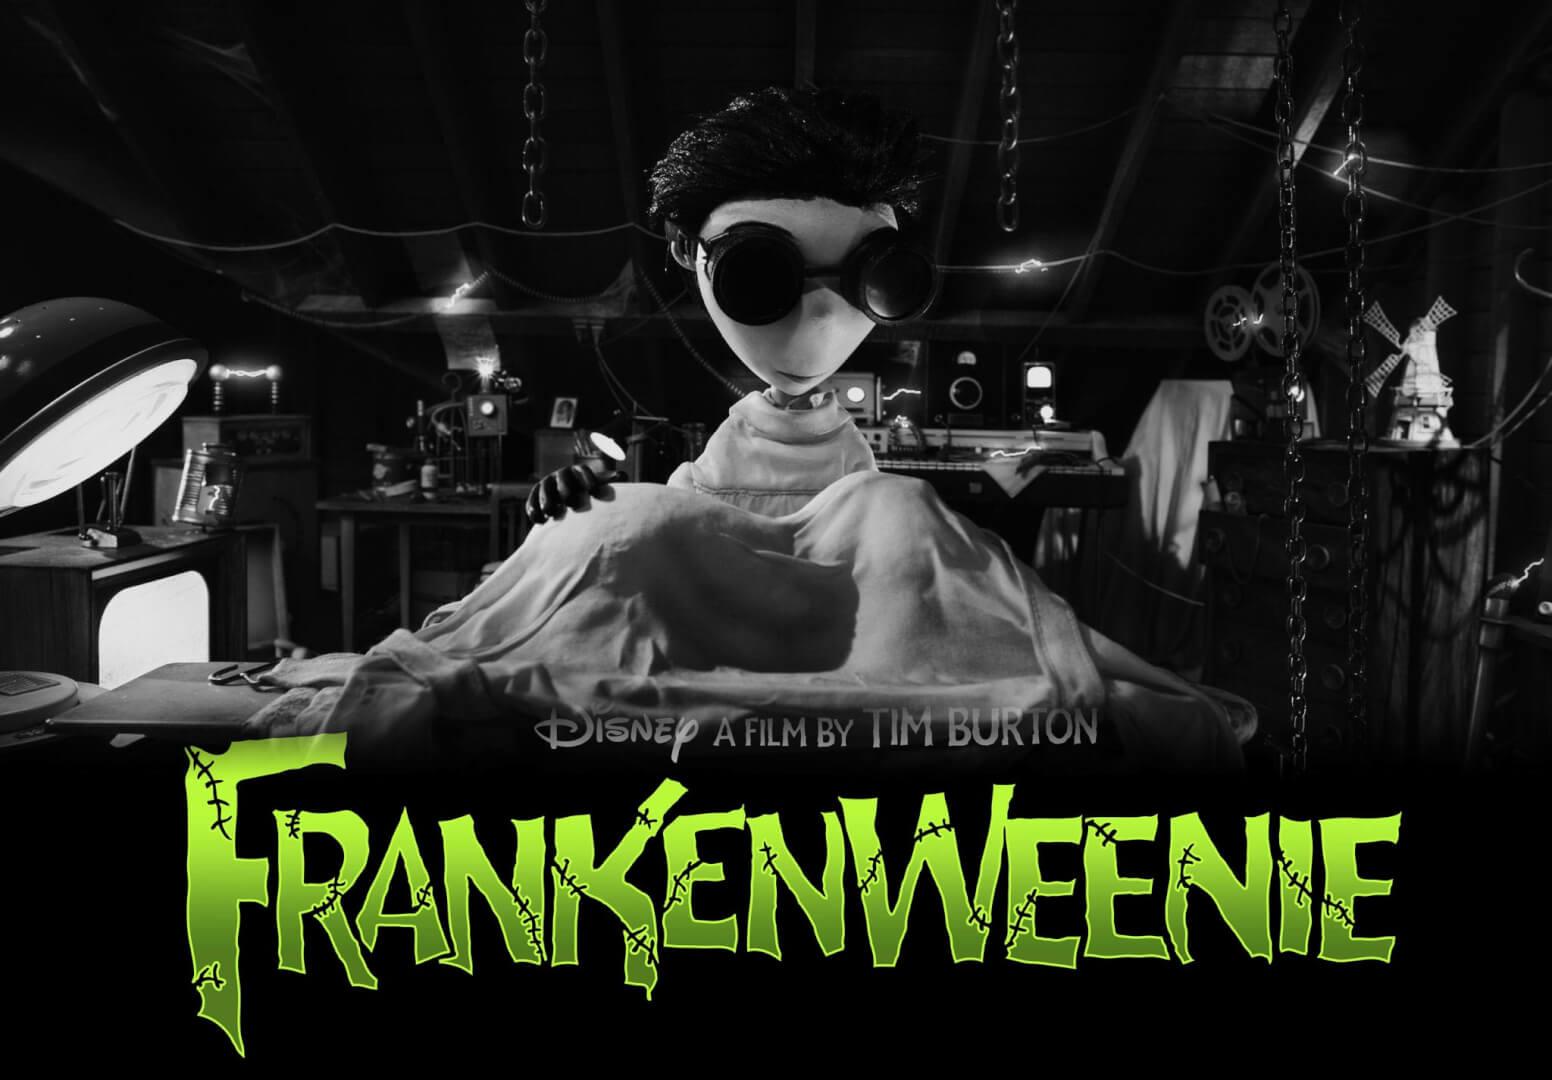 movies tim burton frankenweenie - photo #9